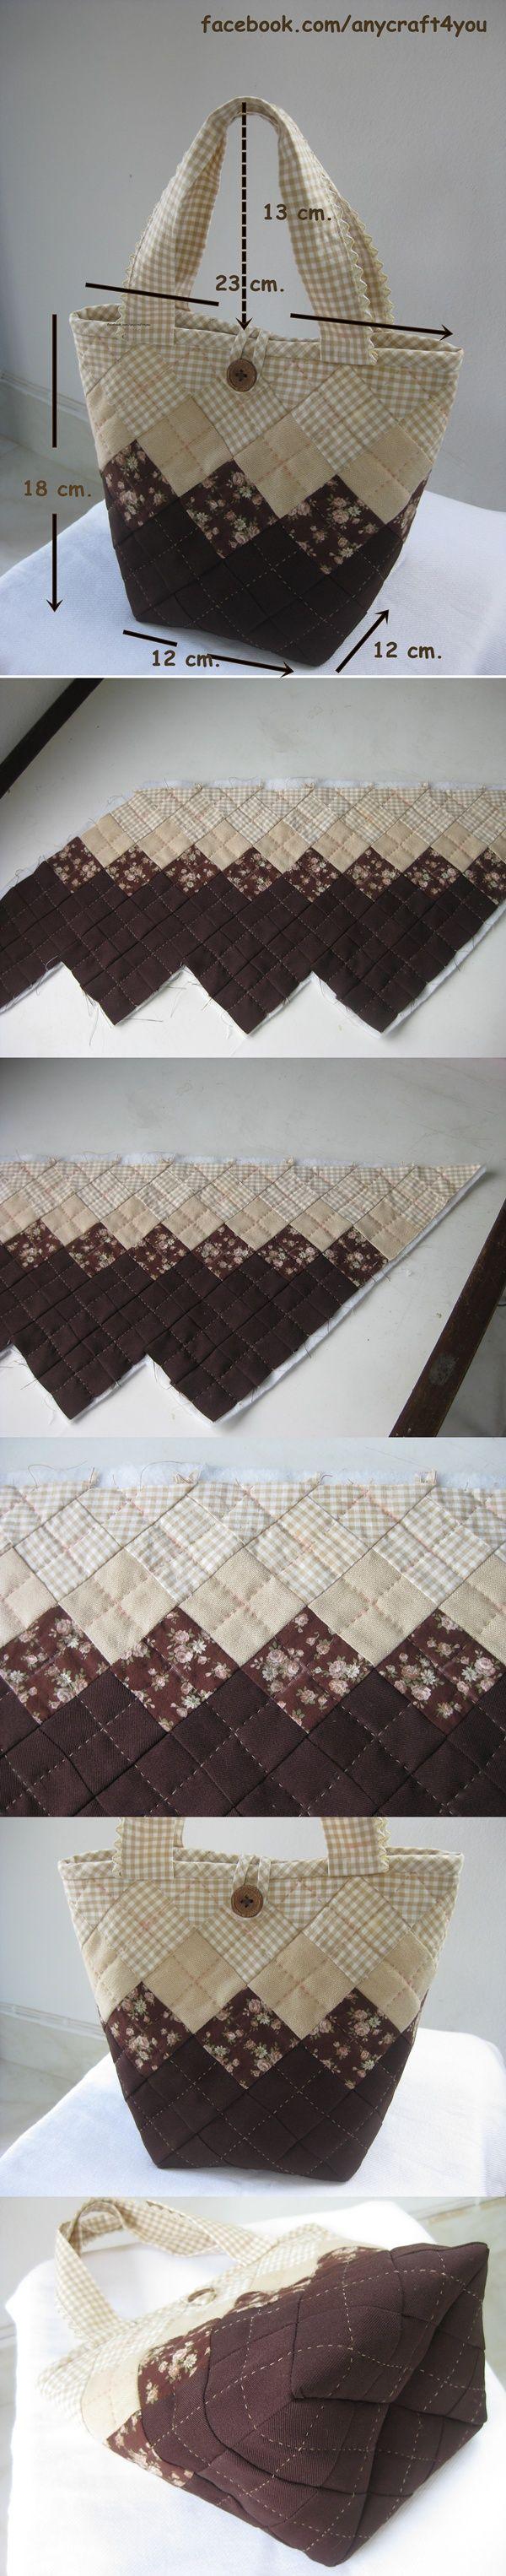 Brownie square lumch bag.